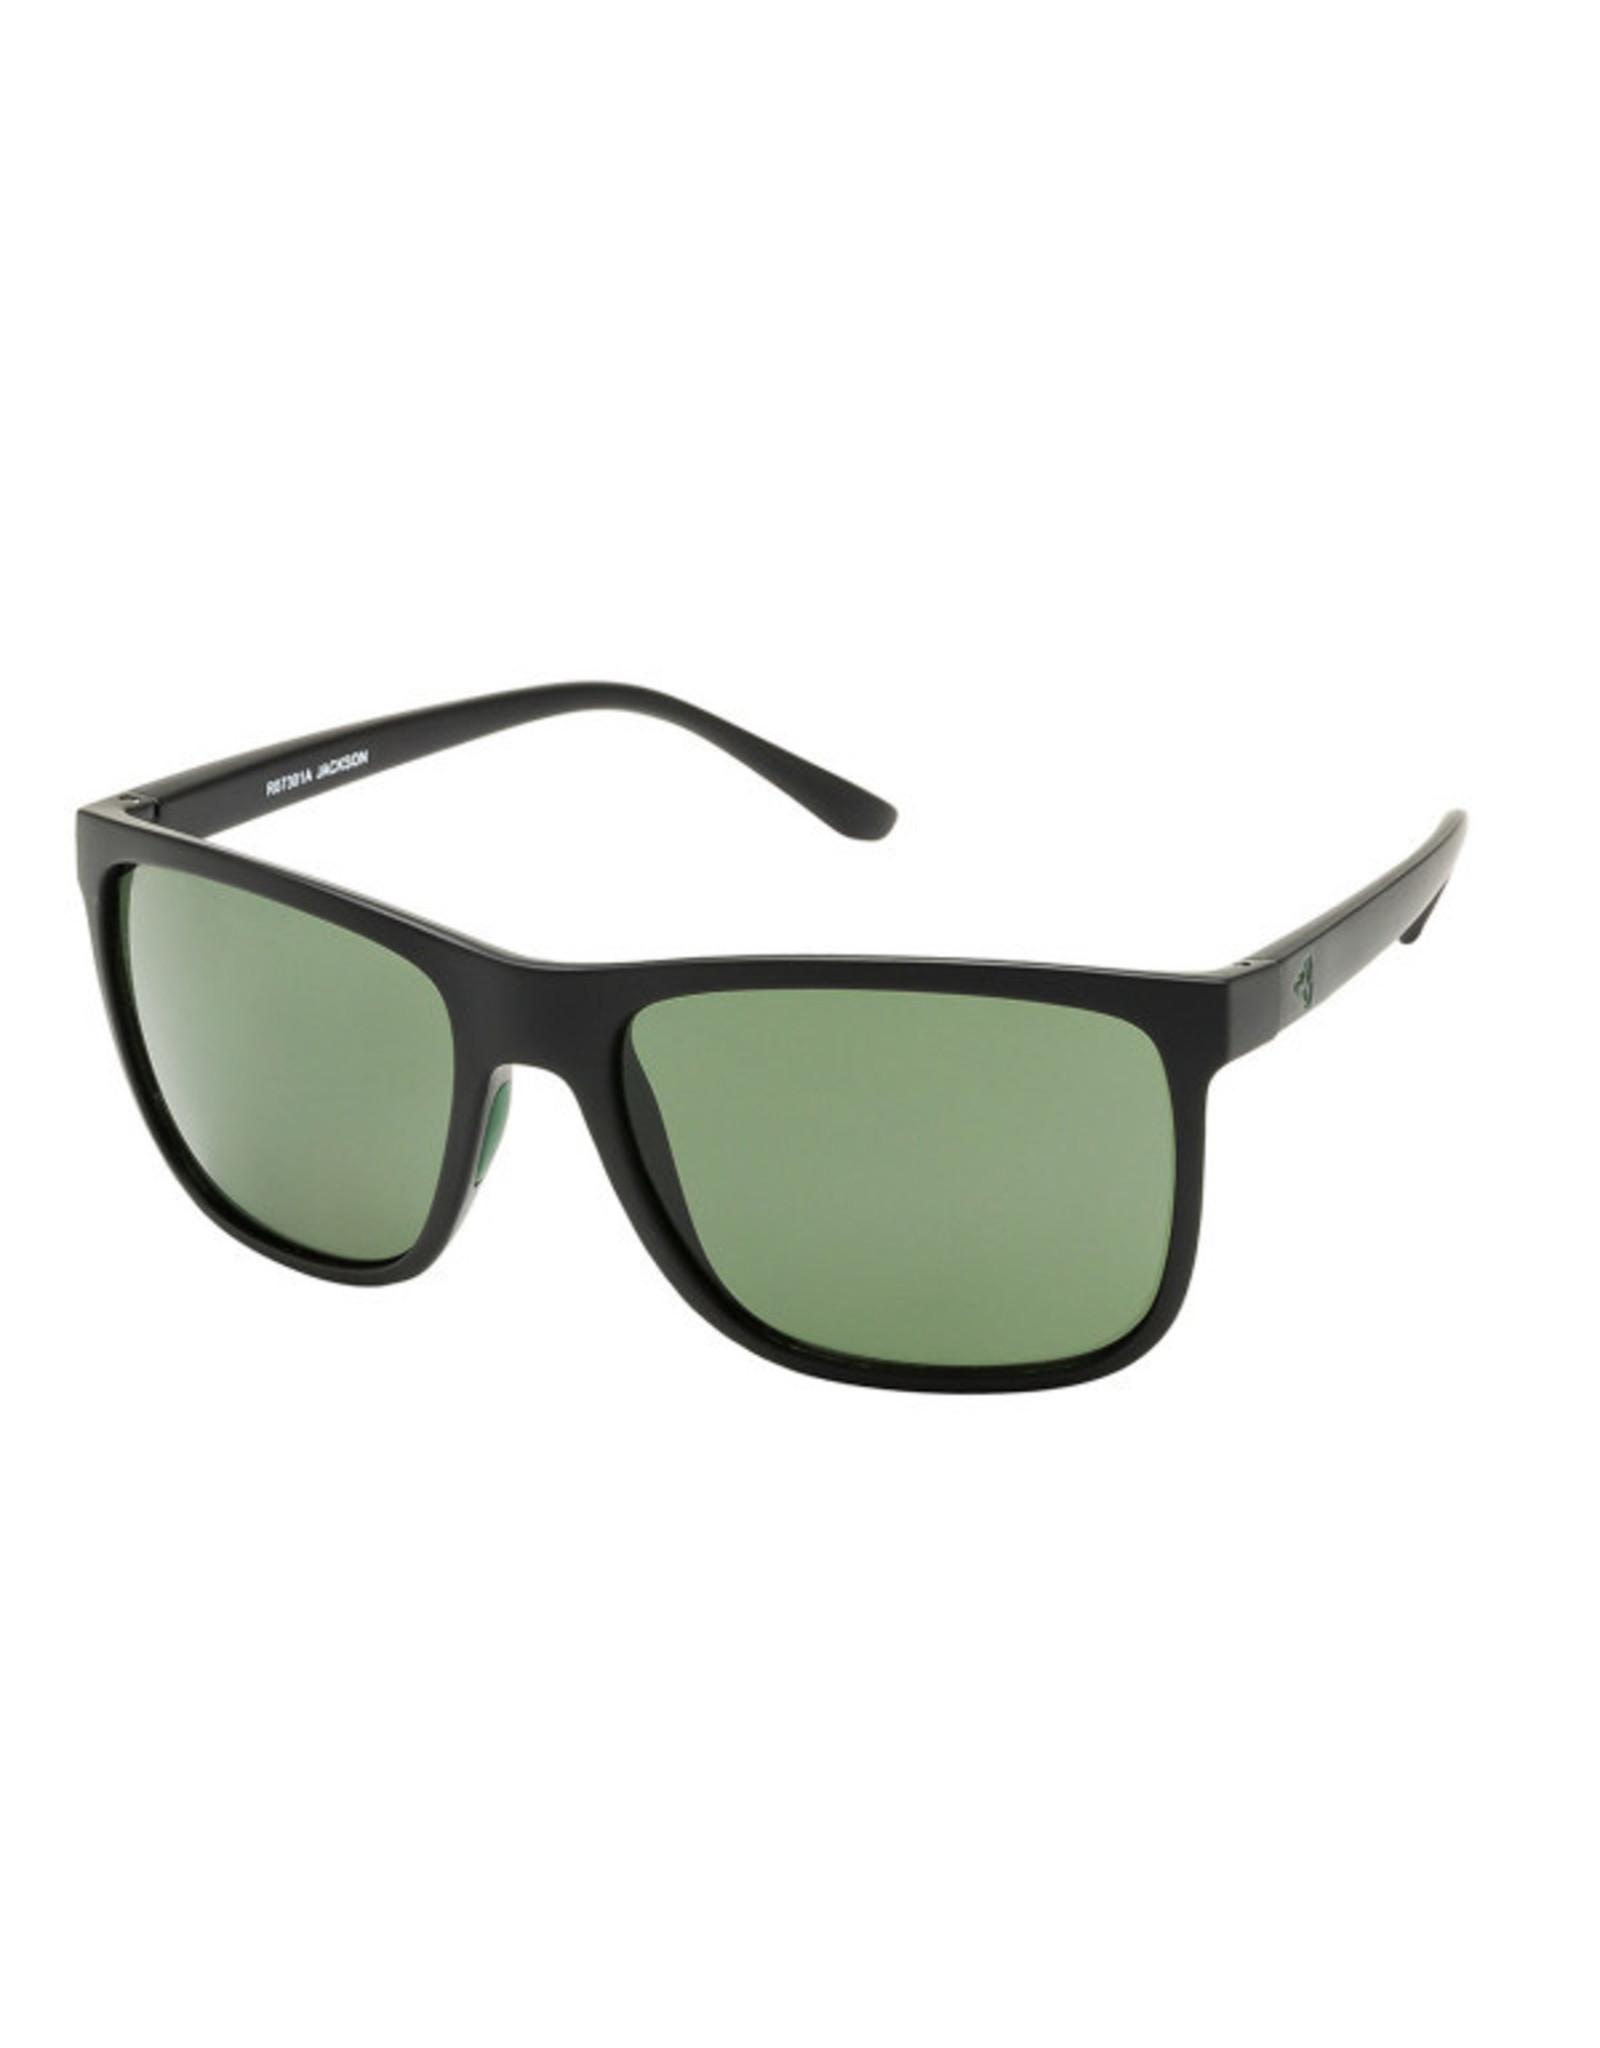 Ryders Eyewear - Jackson Poly Black-Green/Green Lens